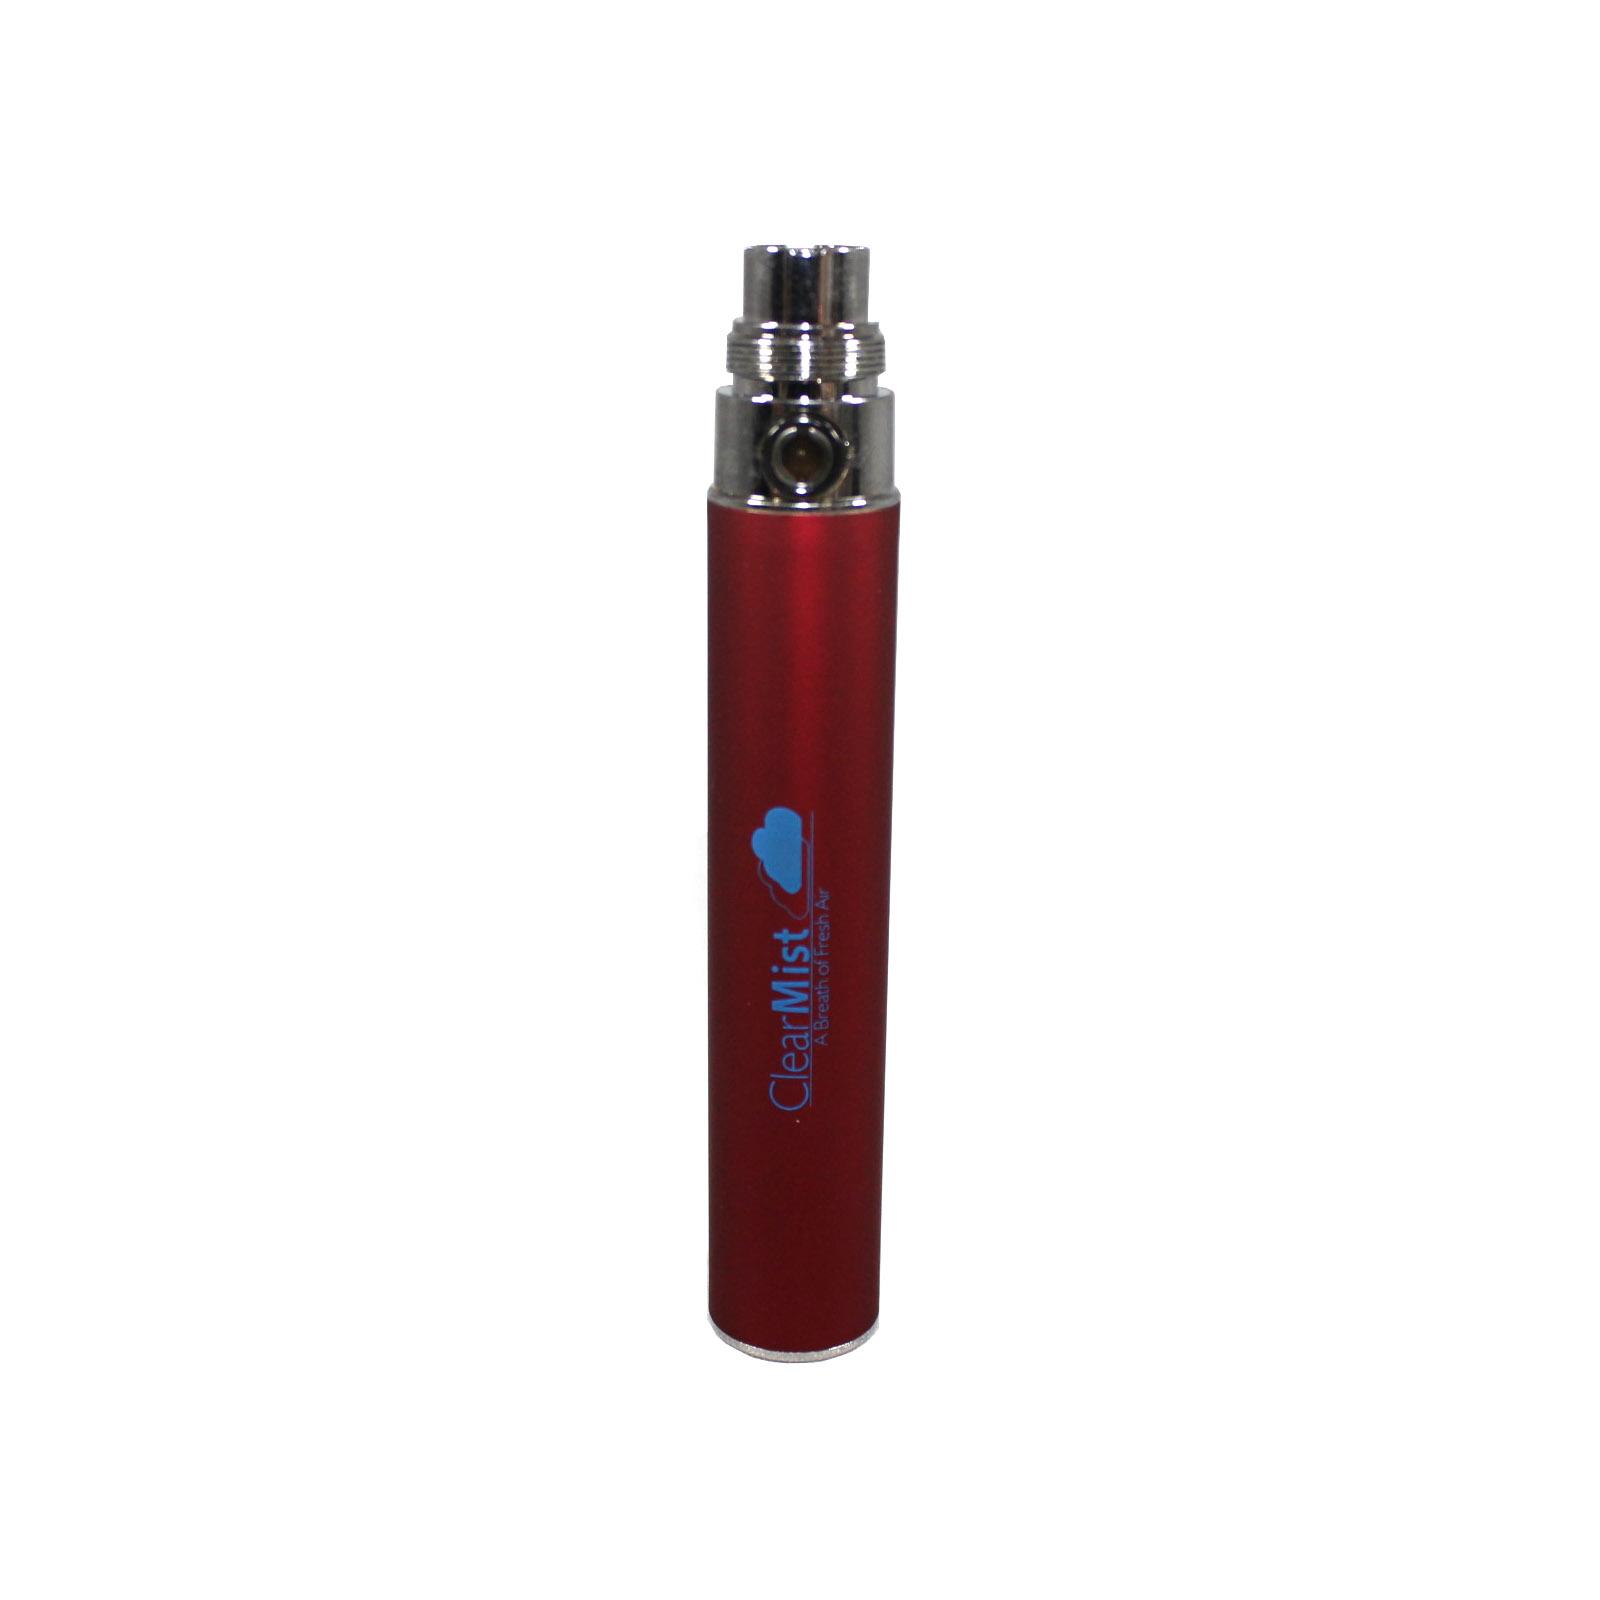 E Cigarette Battery (900 Mah)